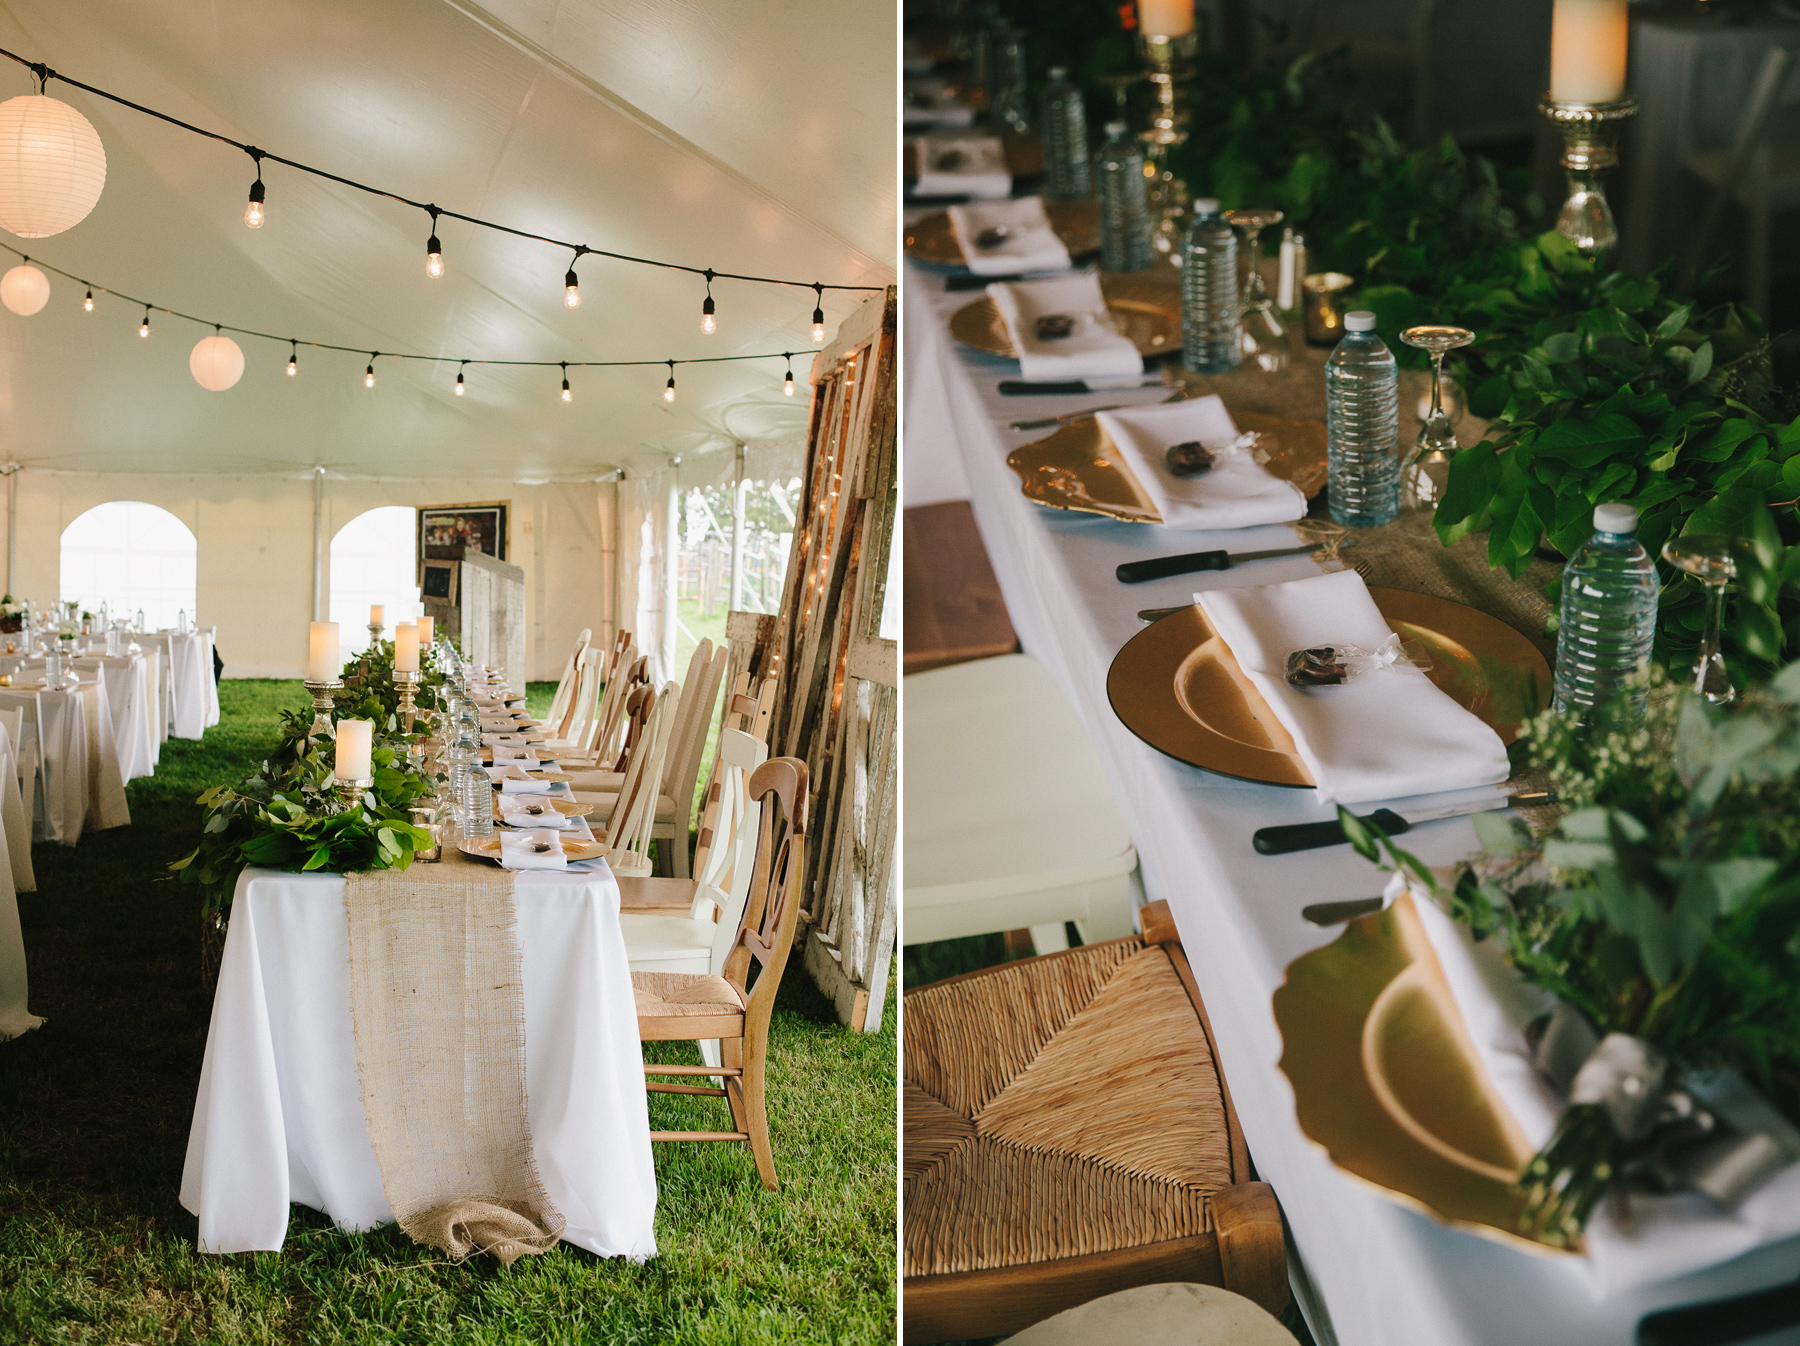 alberta-farm-wedding-photographer-rp-wj-162.jpg